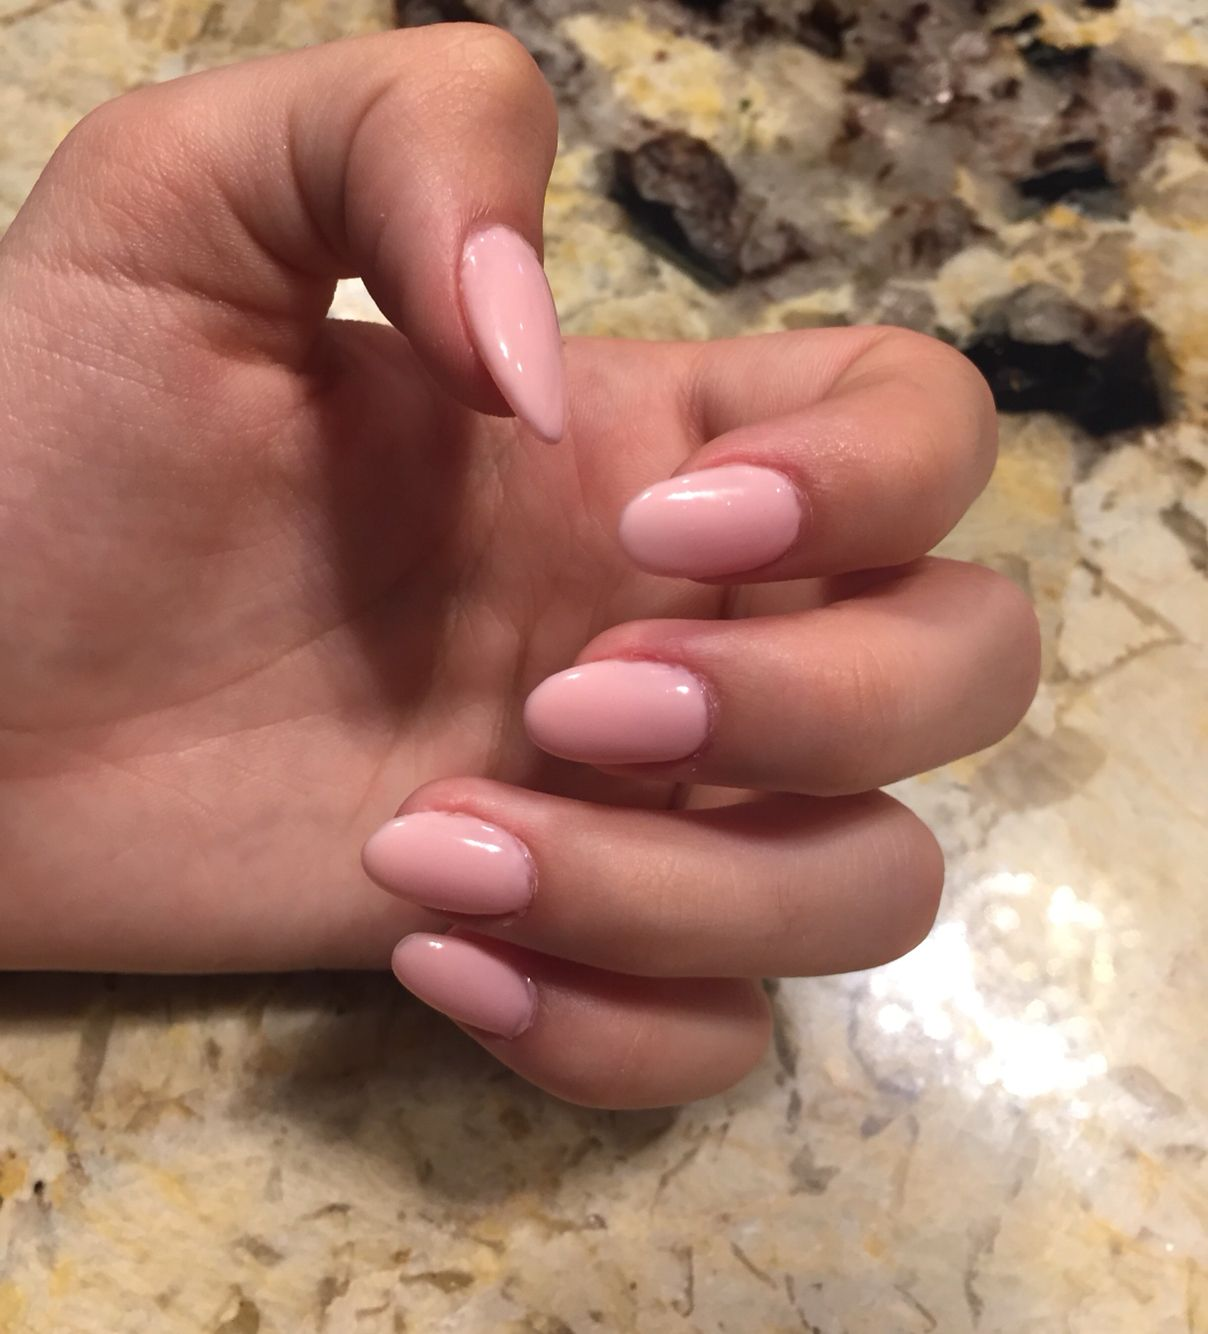 Nude pink almondoval acrylic nails nails pinterest oval nude pink almondoval acrylic nails prinsesfo Choice Image